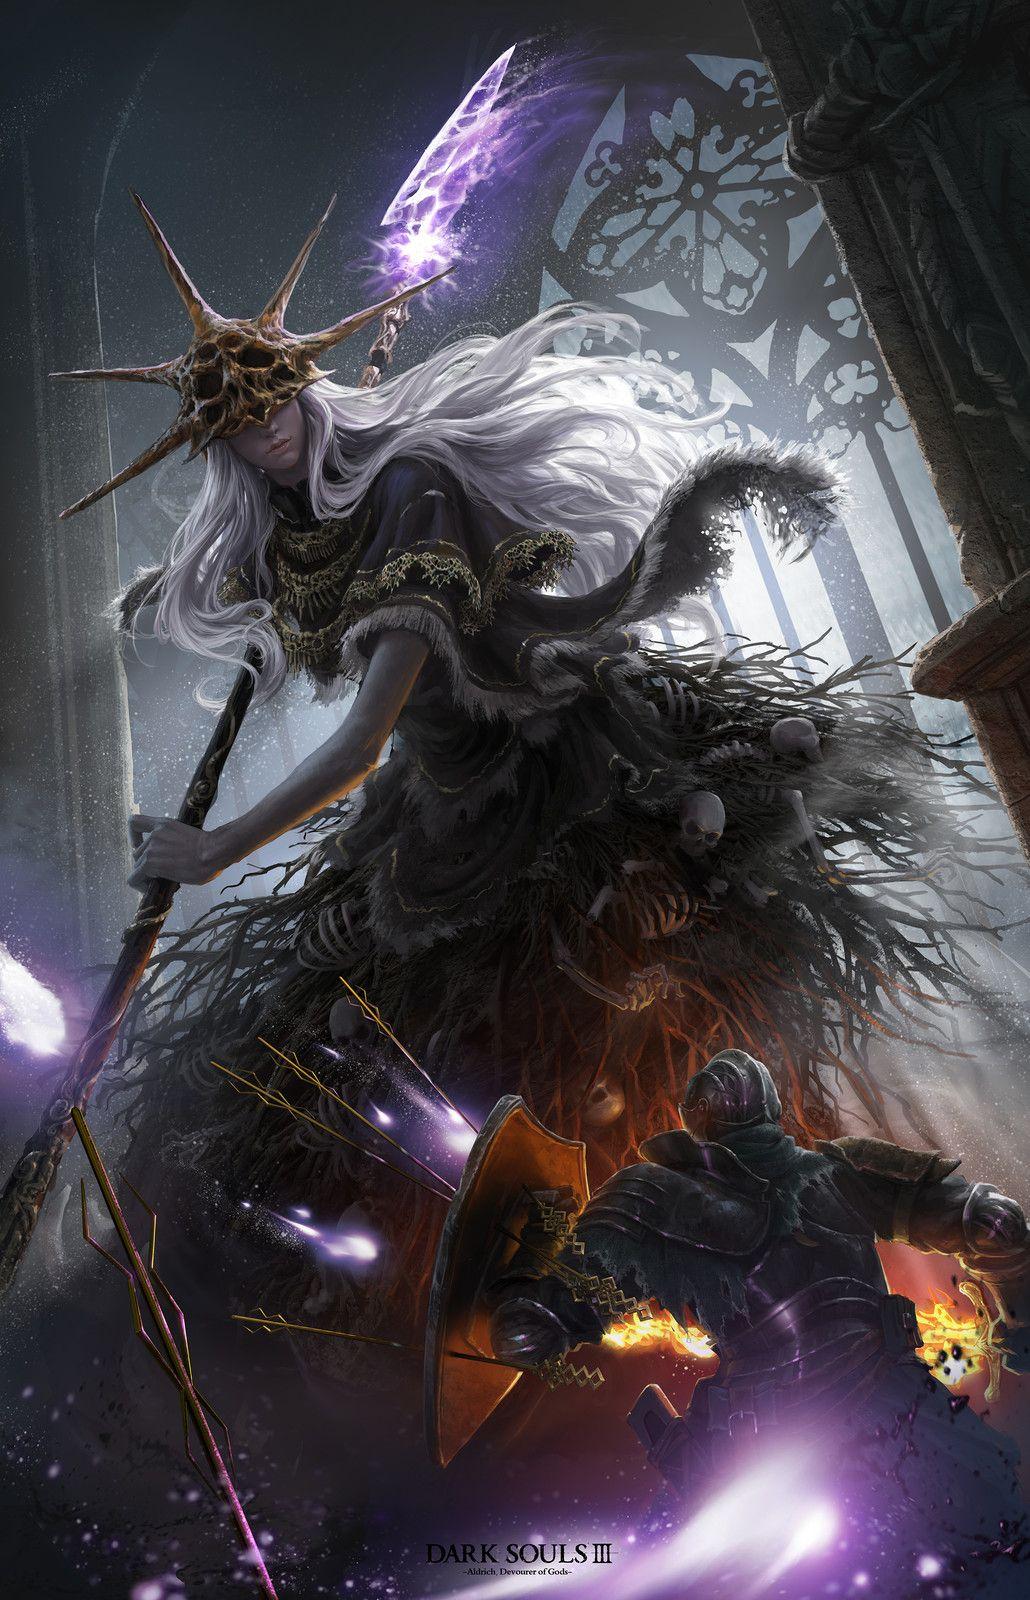 Pin De Andre Goulart Em Dark Souls 3 Em 2019 Arte Dark Souls